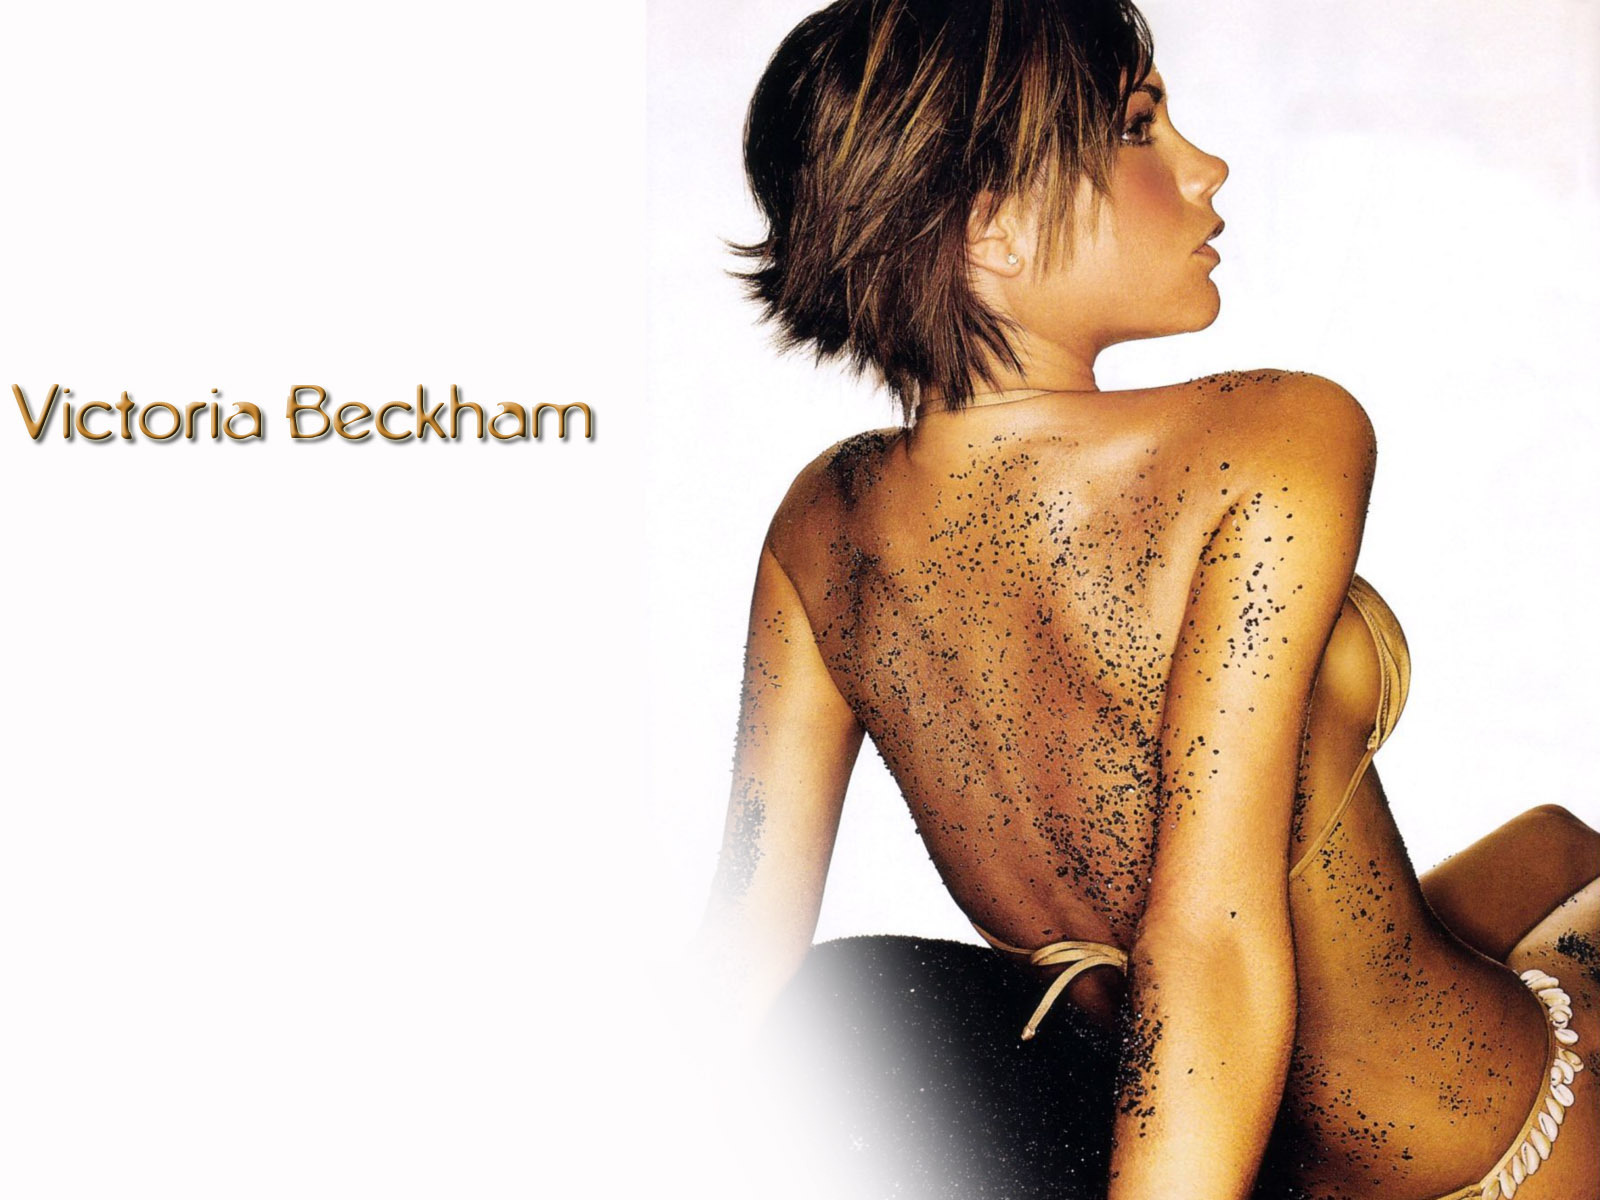 Victoria Beckham - Victoria Beckham Wallpaper (20981143) - Fanpop ... Victoria Beckham